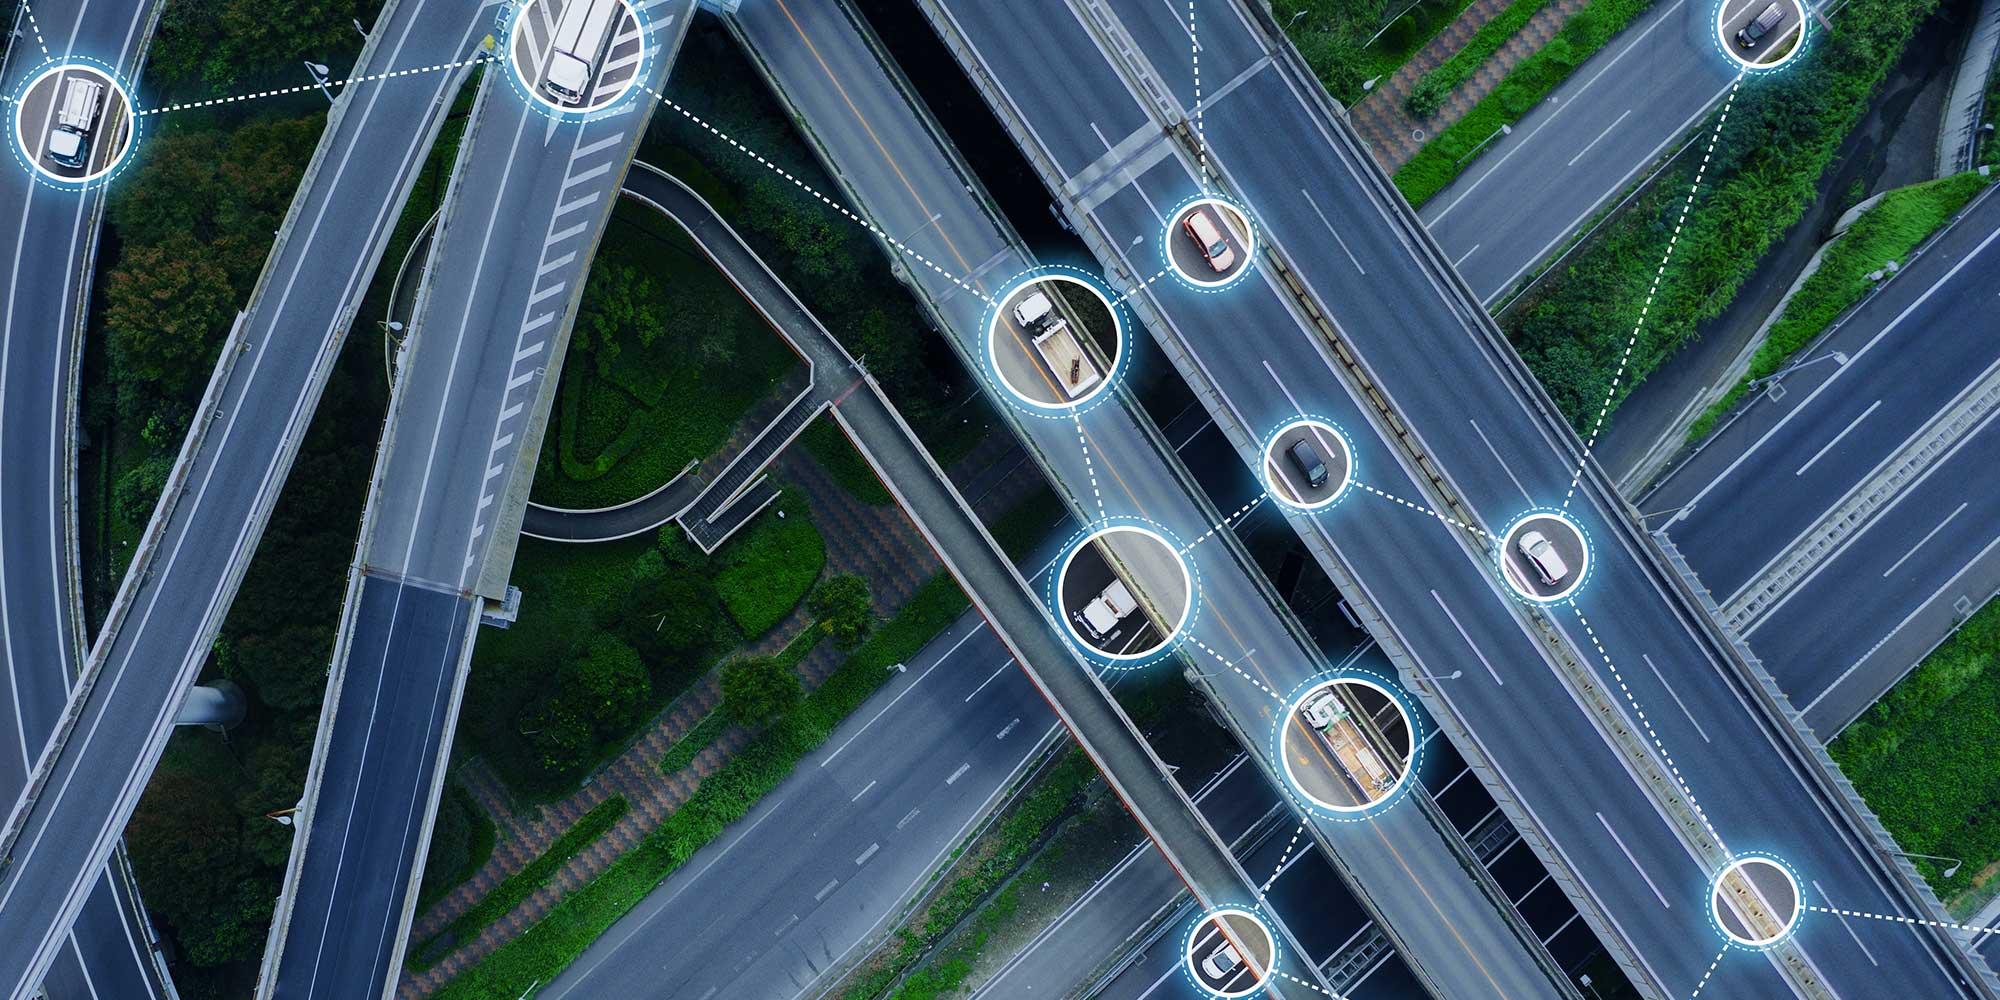 Autonomous Logistics on a Logistics Network